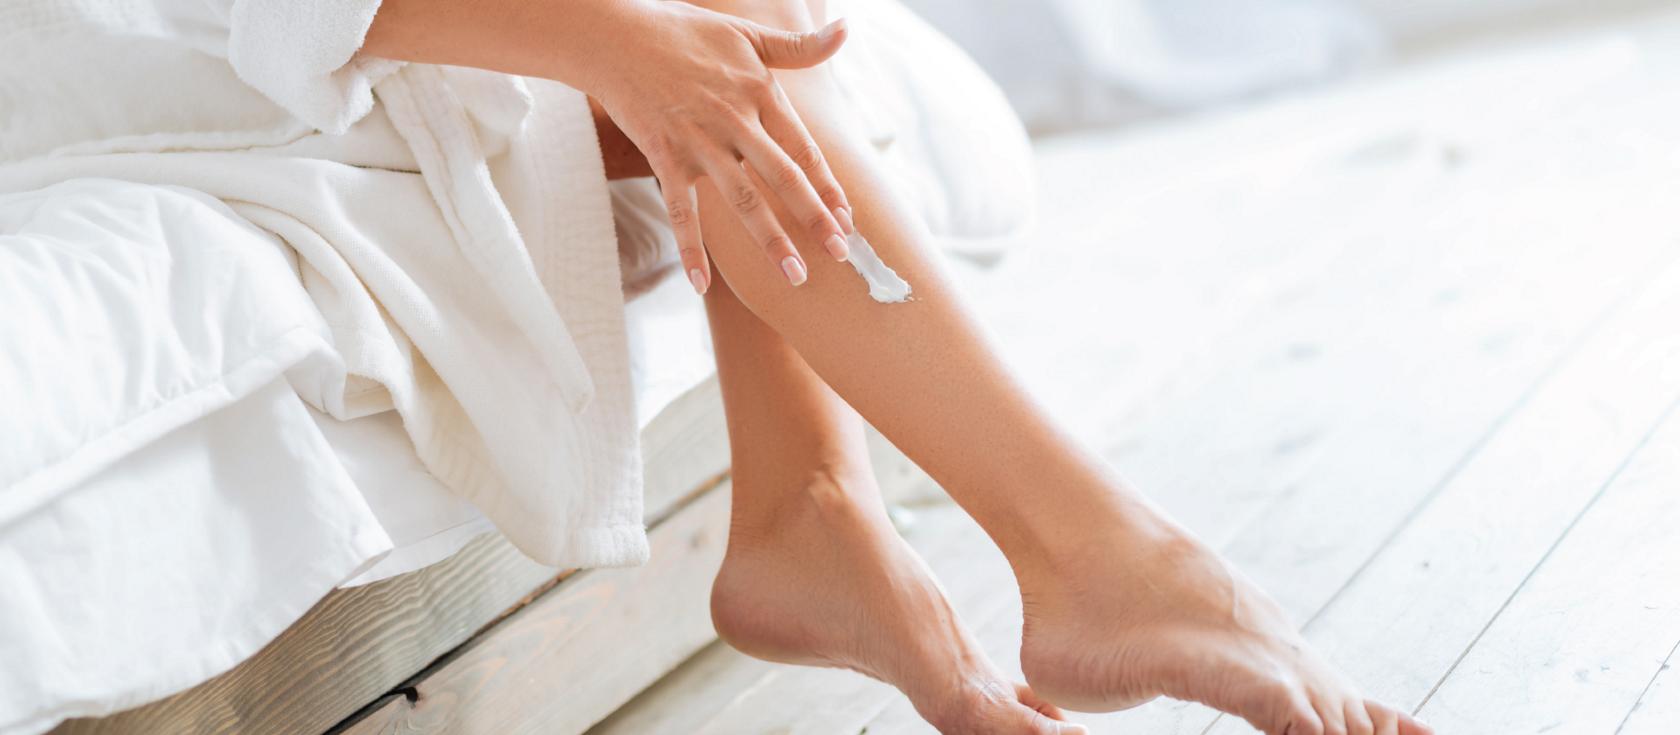 Severe Dry Skin Symptoms Dermatologist Treatment Tips